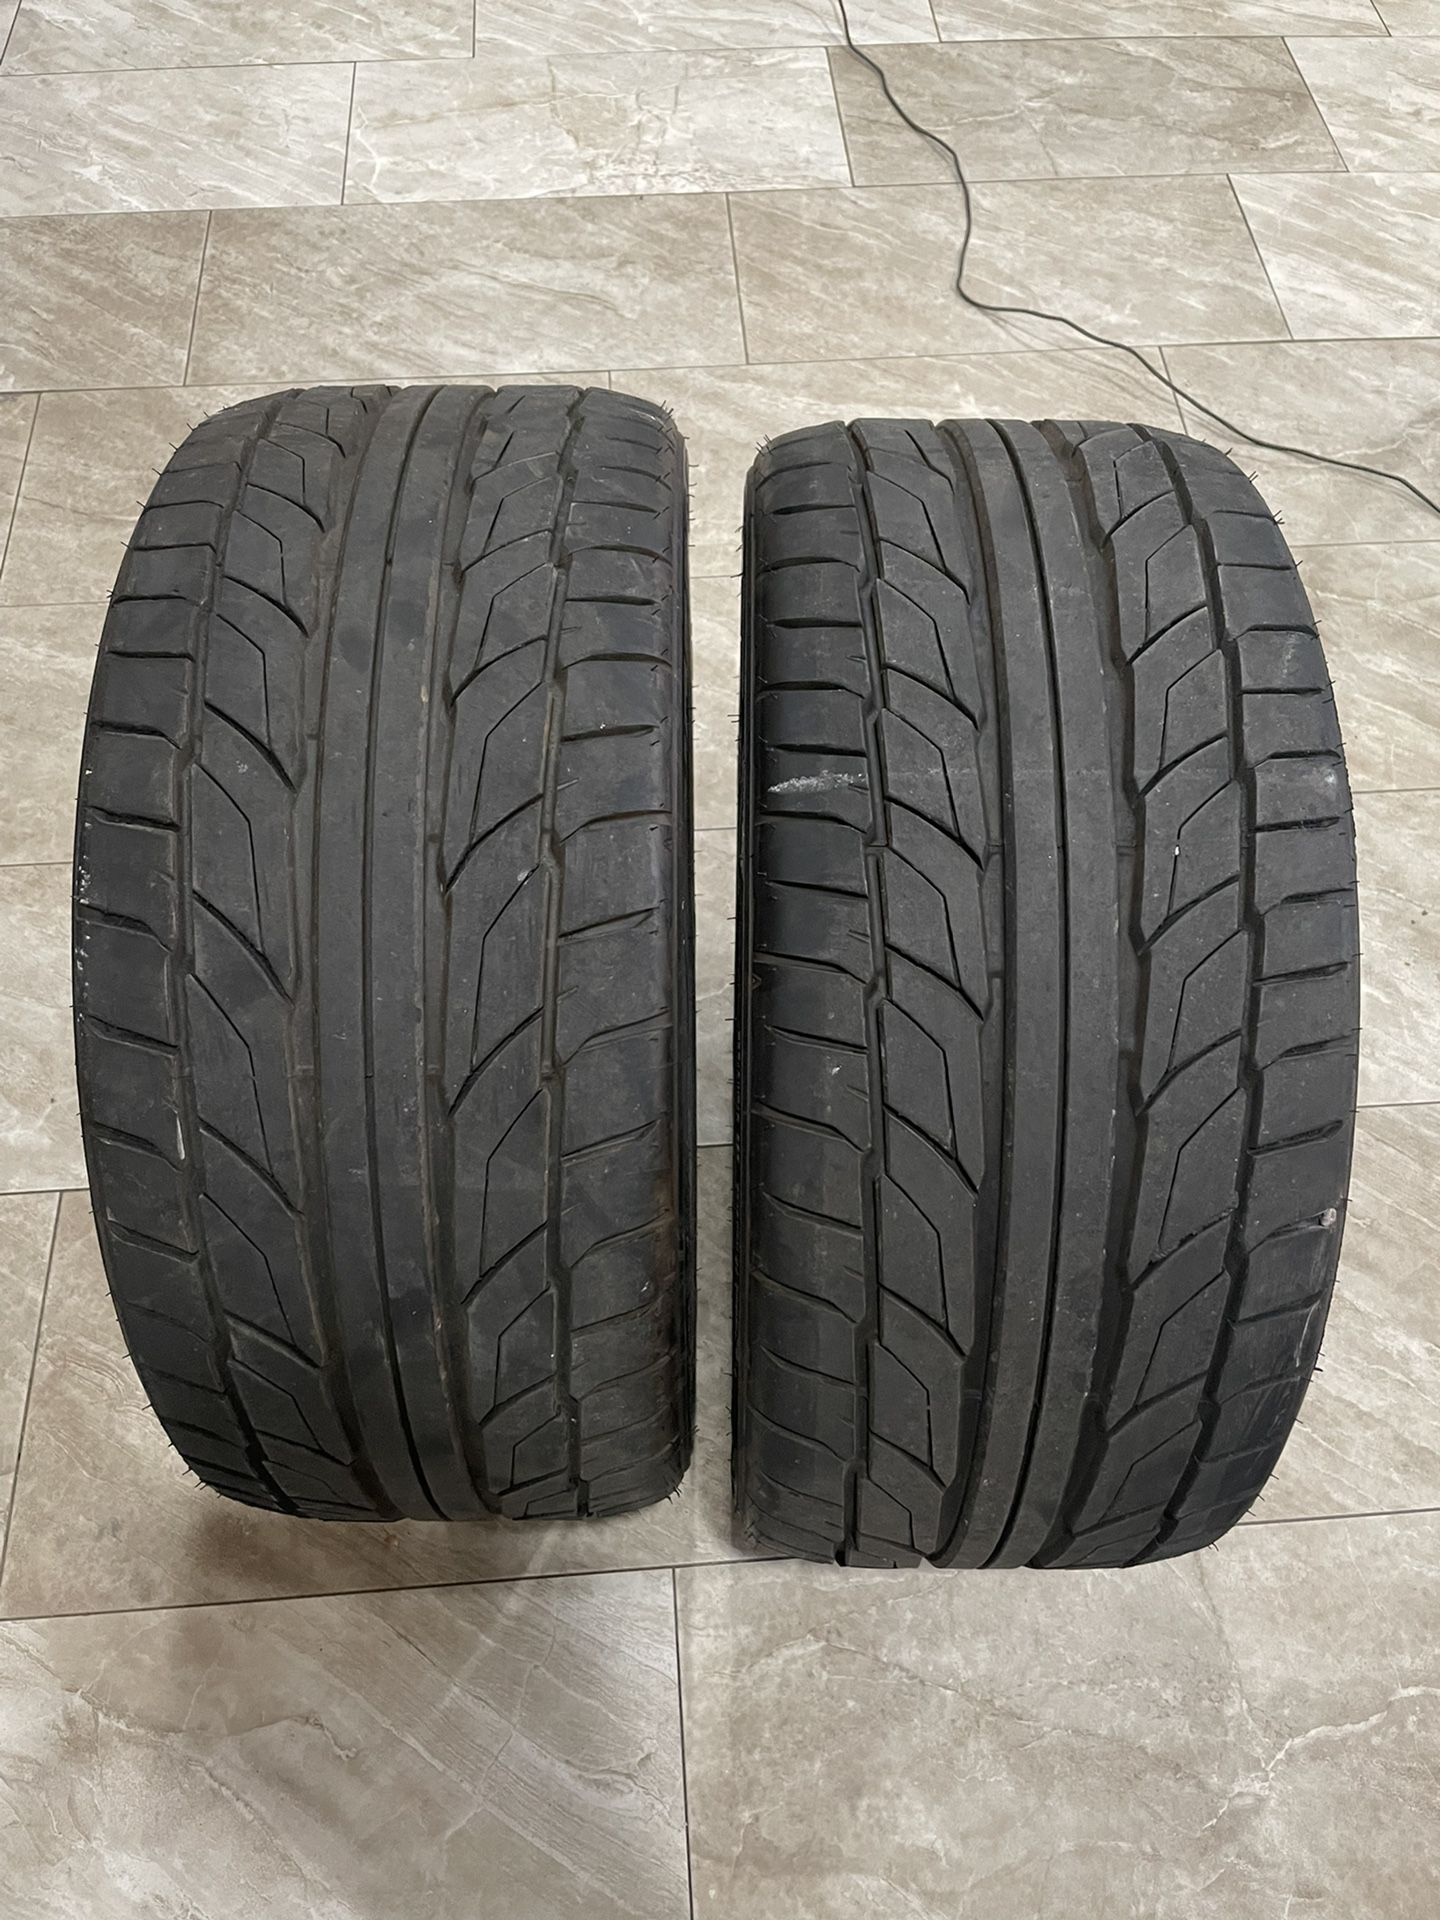 "Only 2 Wheels Size 18"" 255/35zR18 94 W - Nitto"